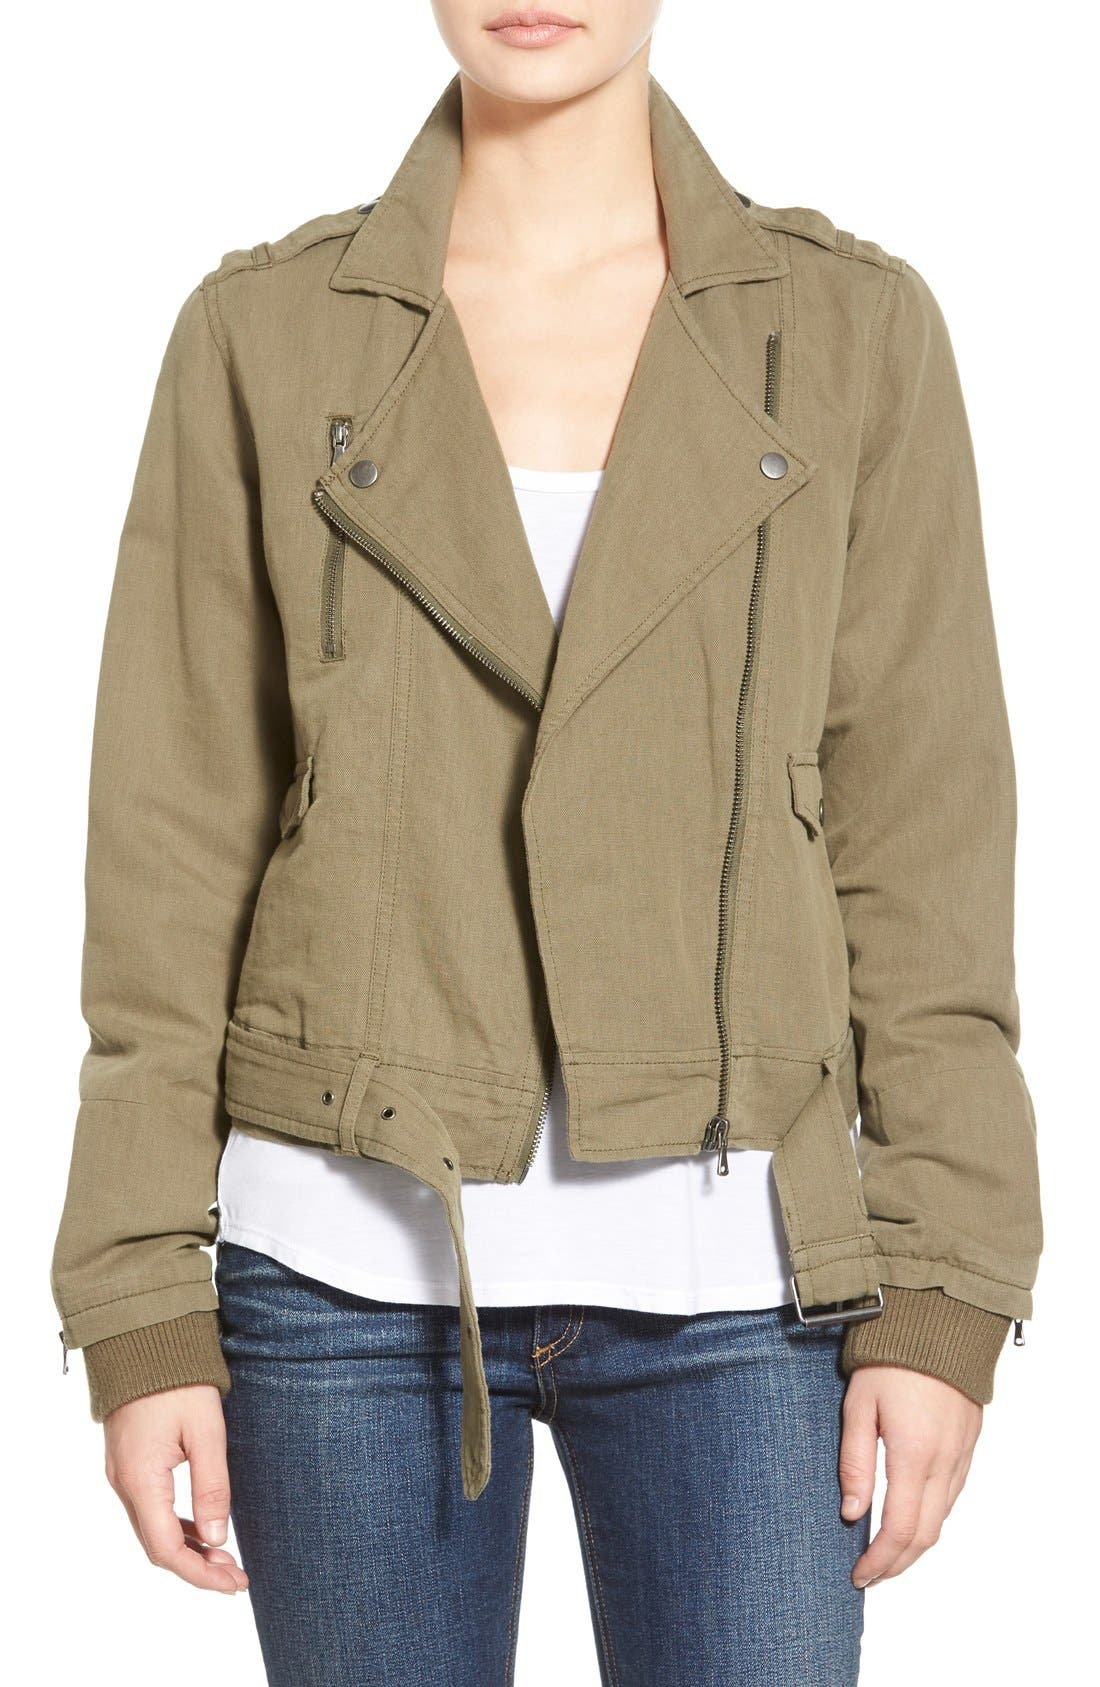 Alternate Image 1 Selected - Paige Denim 'Marjorie' Twill Moto Jacket